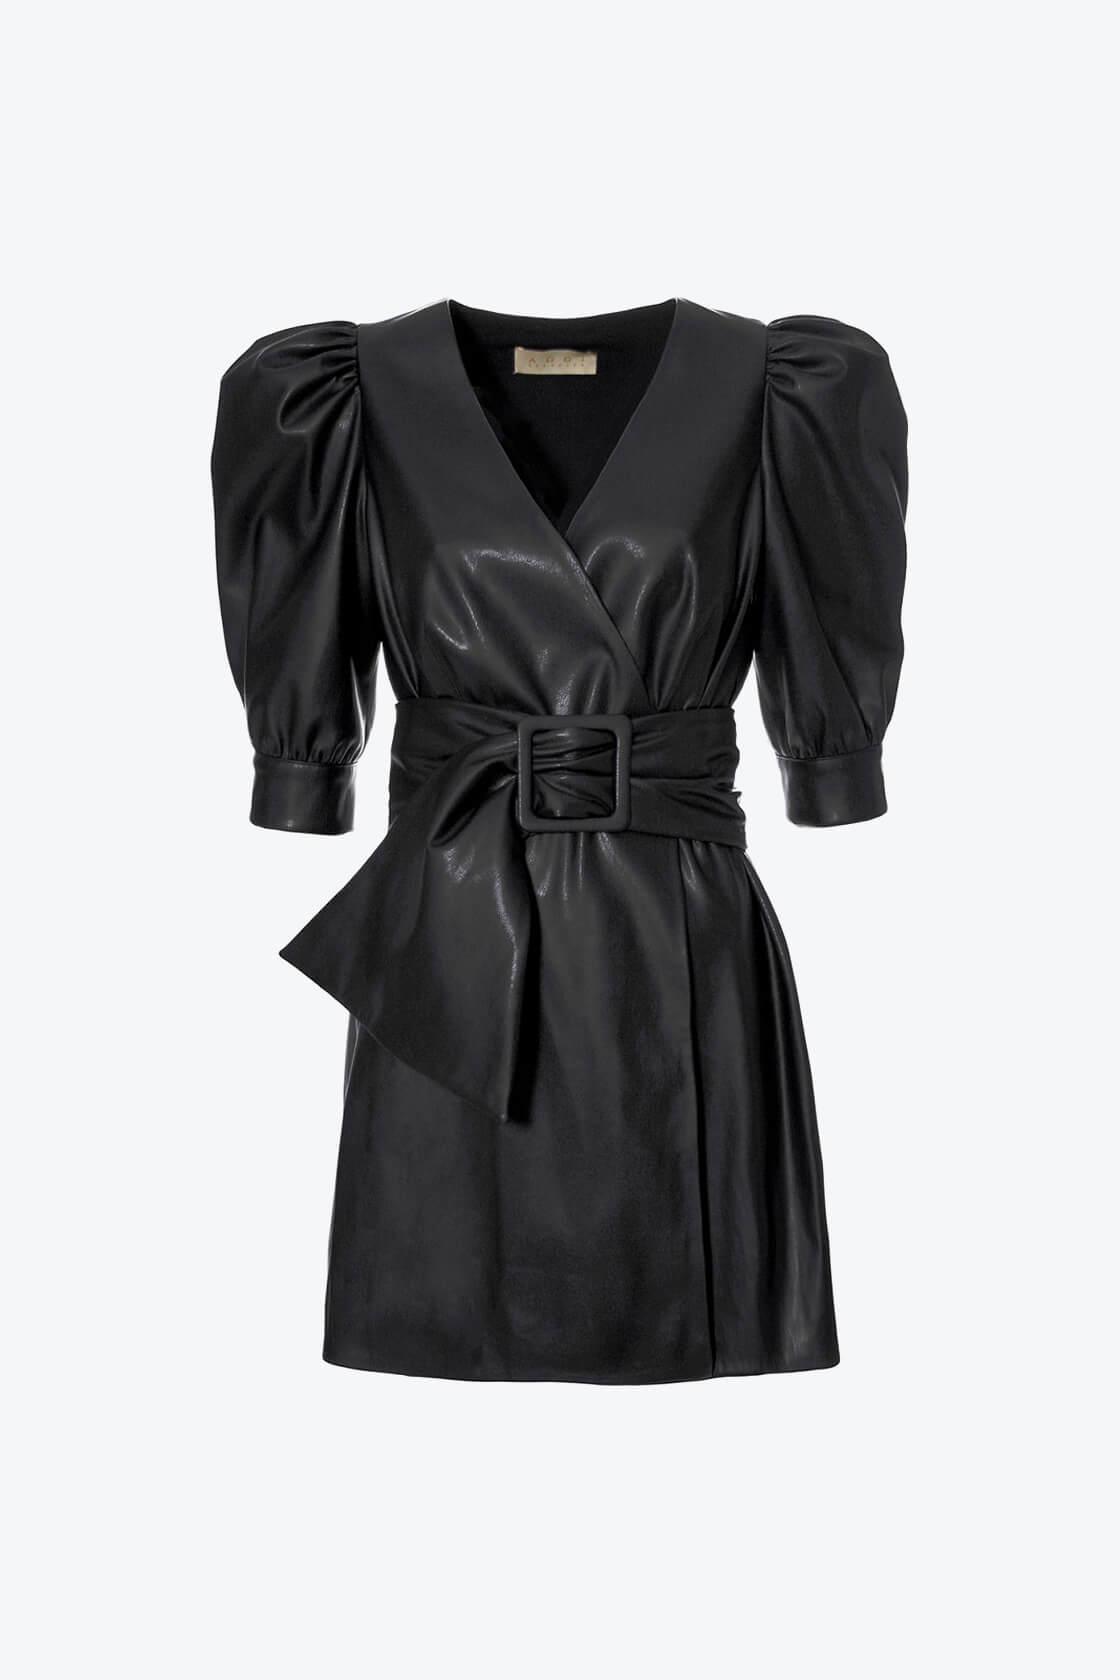 OL100002602 Dresses Andrea Cynical Black1